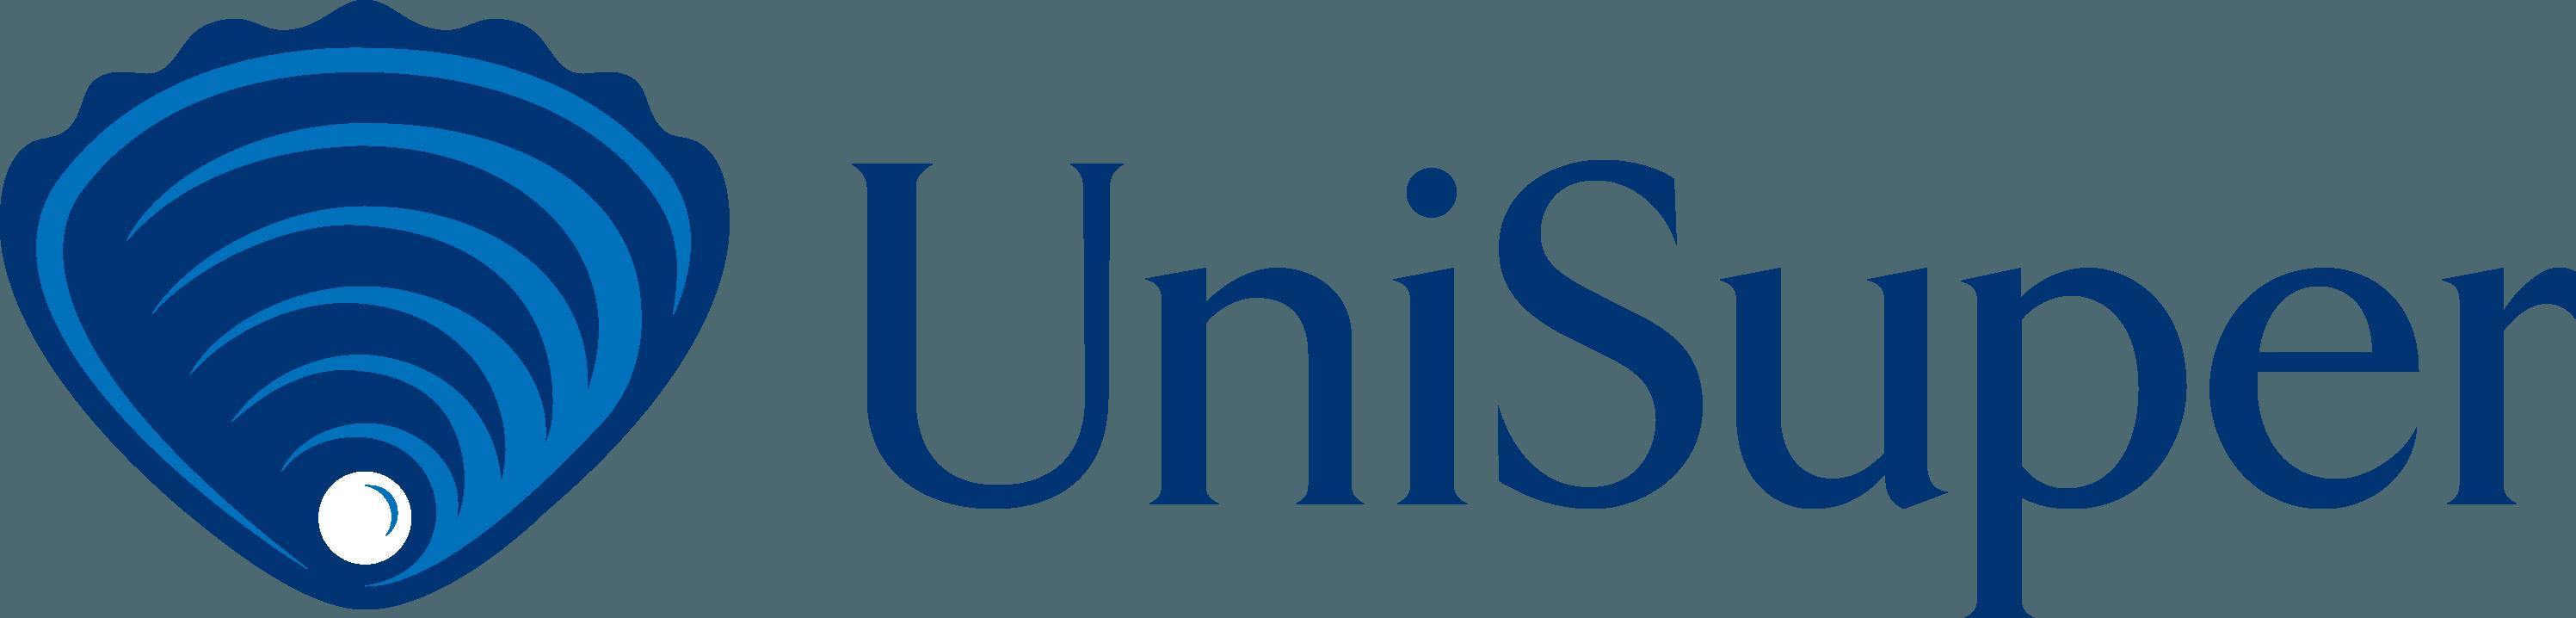 UniSuper Logo png